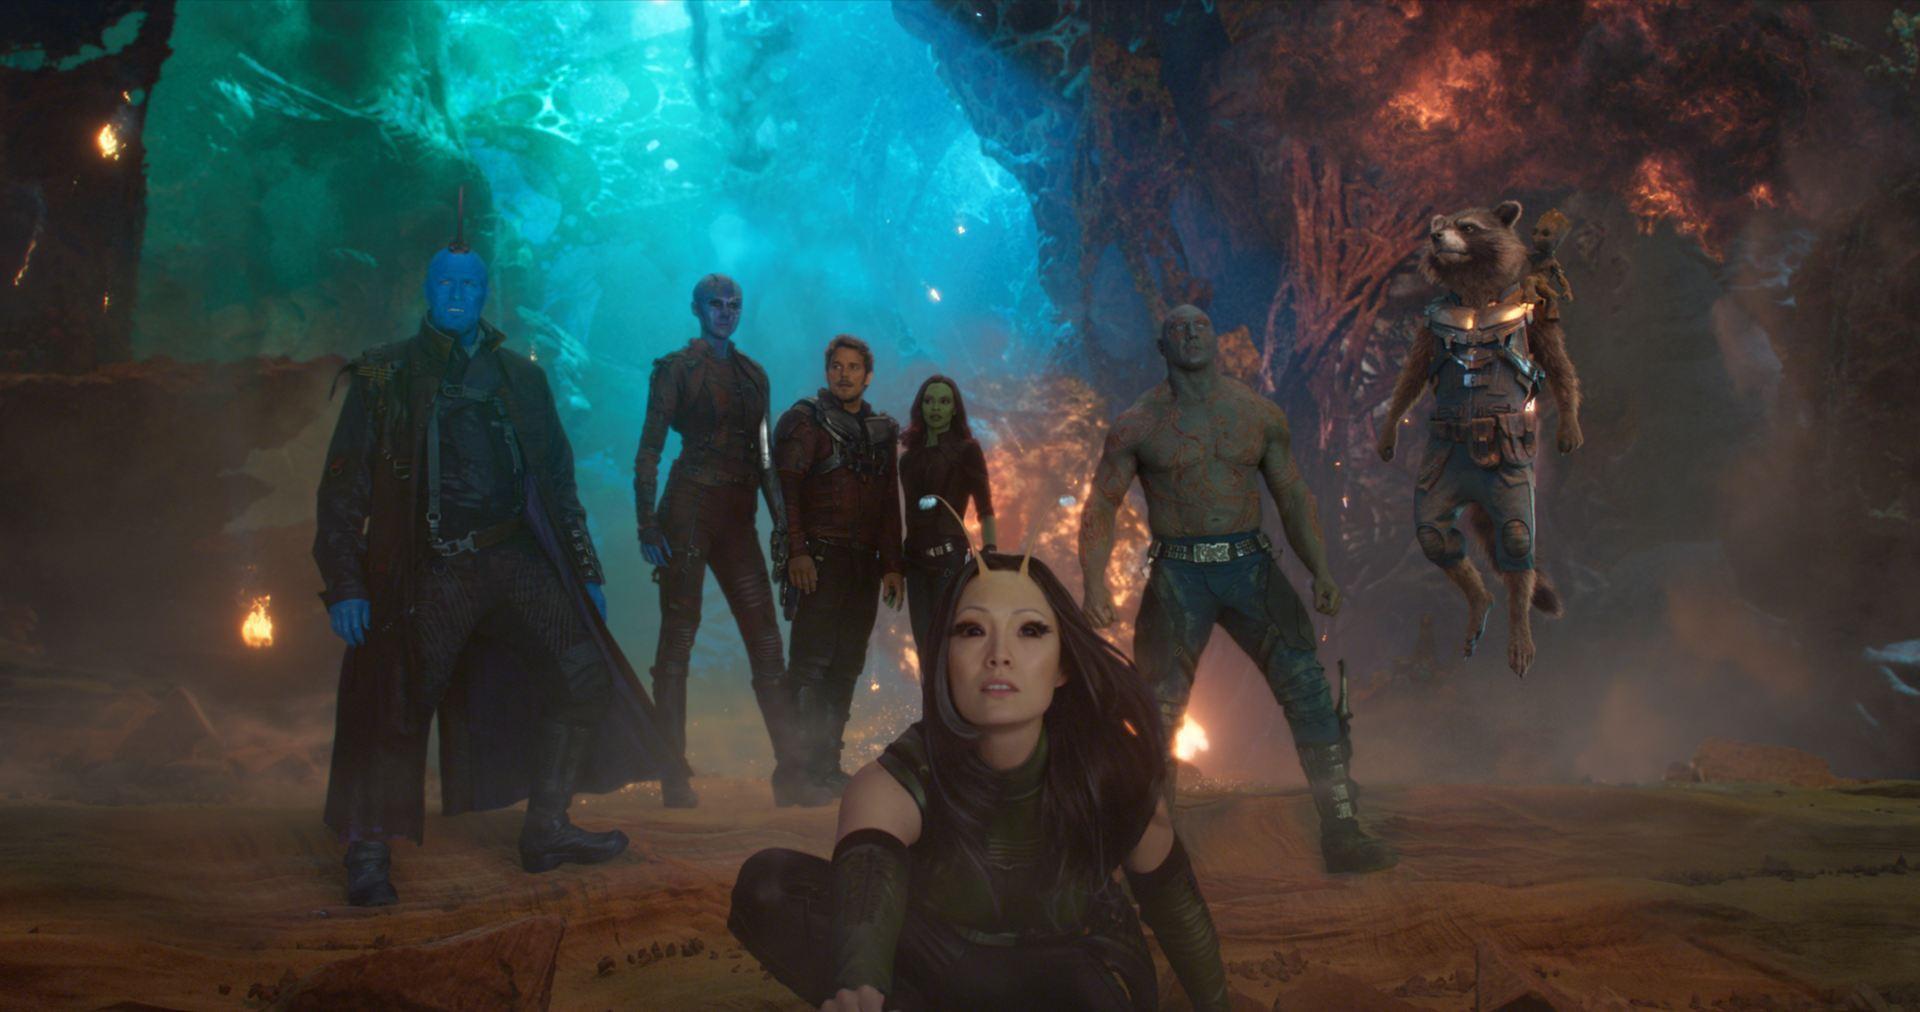 Avengers Endgame Cast Wallpapers - Wallpaper Cave